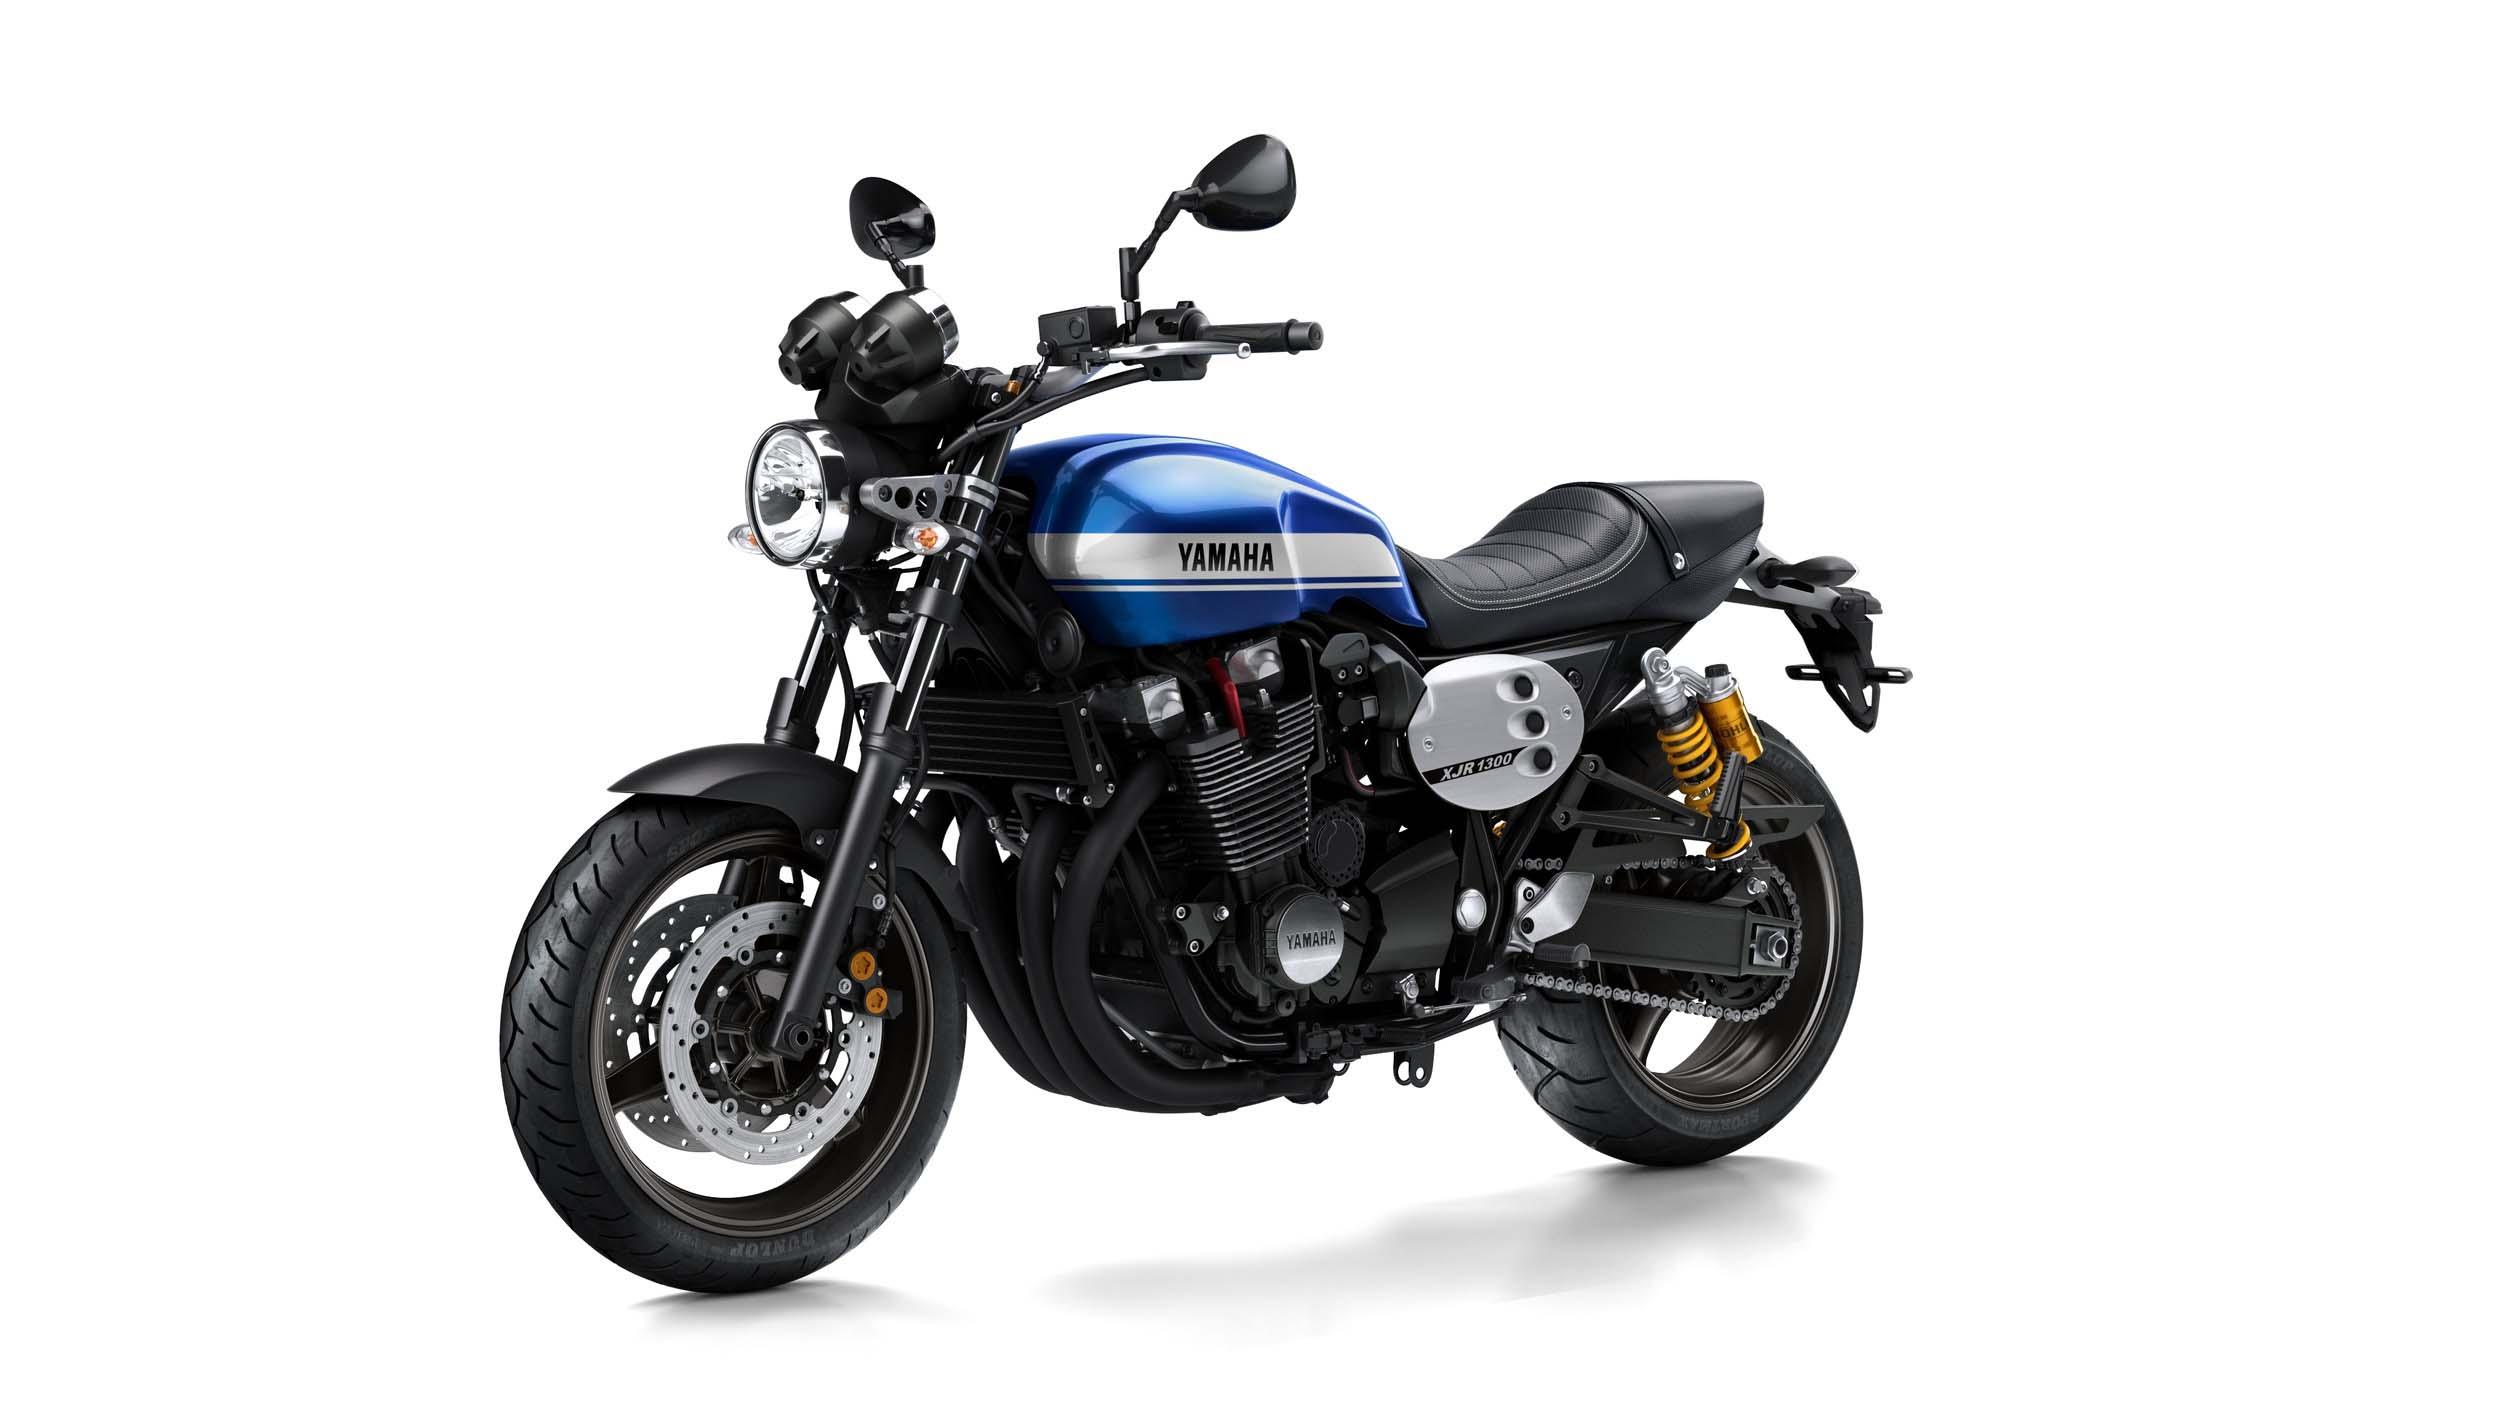 2015 yamaha xjr1300 racer japan 39 s cafe racer asphalt for Yamaha 1300 motorcycle